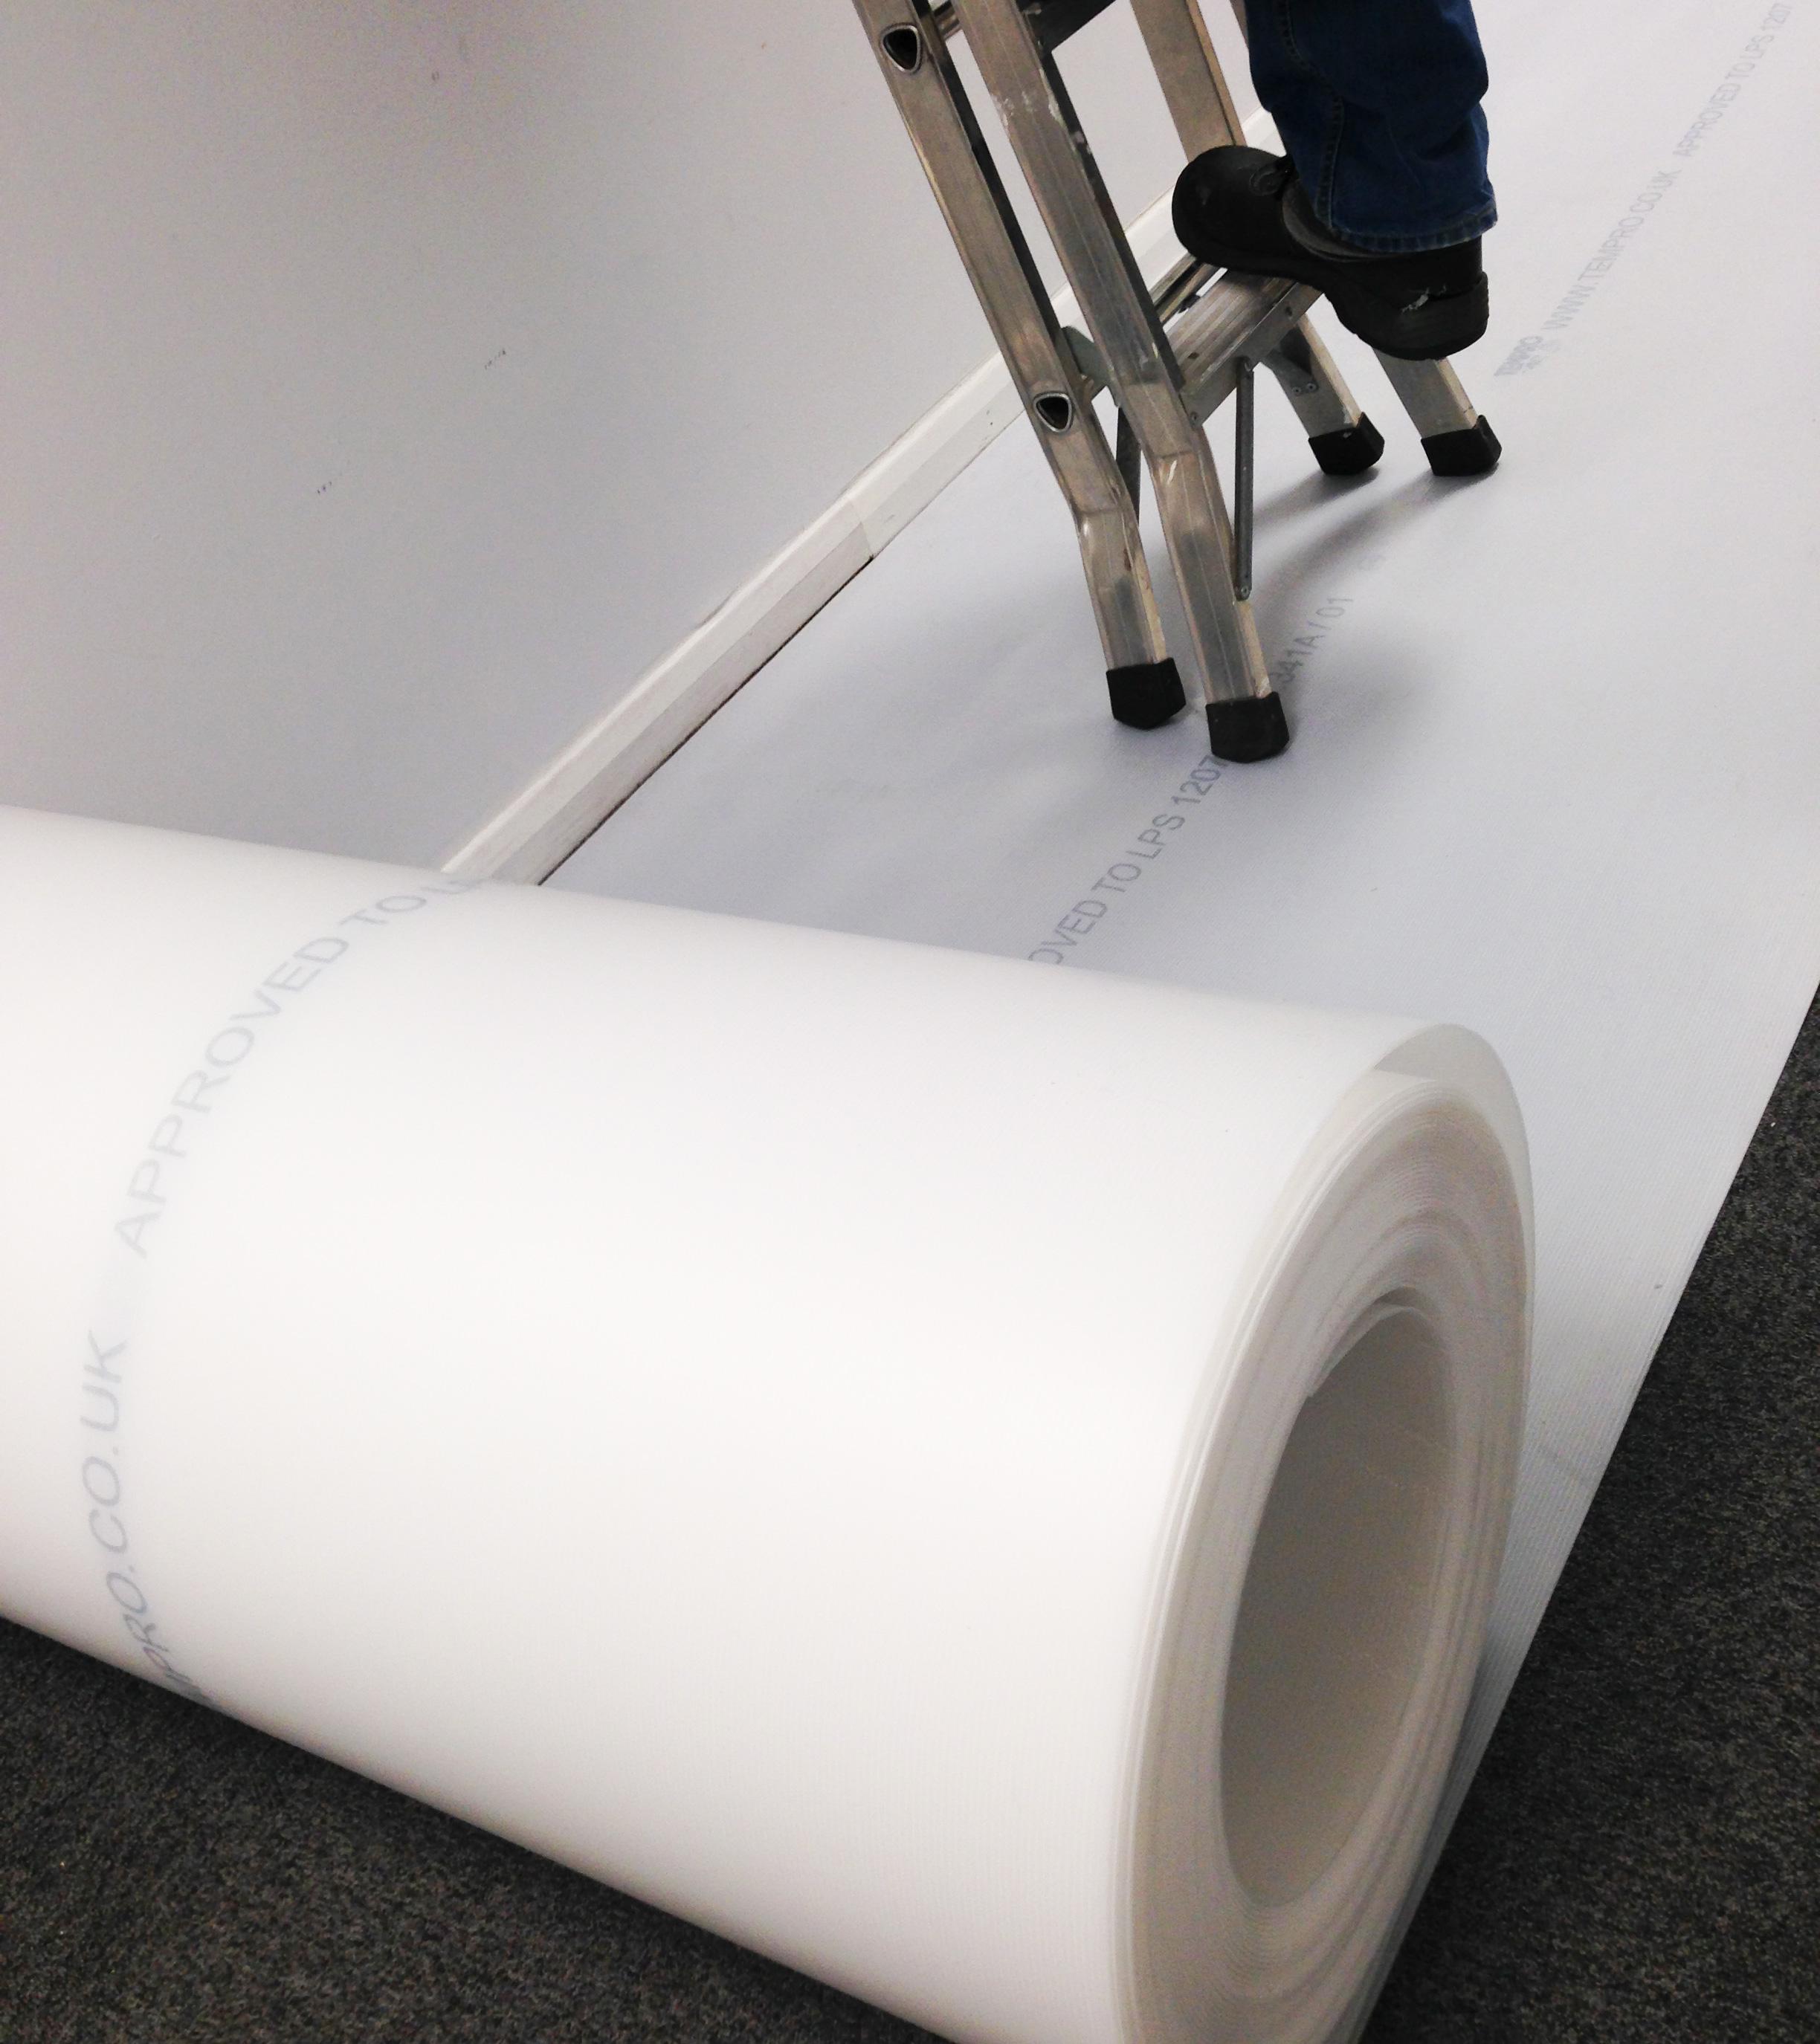 Correx (corex) Corrugated Plastic Roll Floor & Surface Protector 1M x 50M x 2mm White Fire Retardant